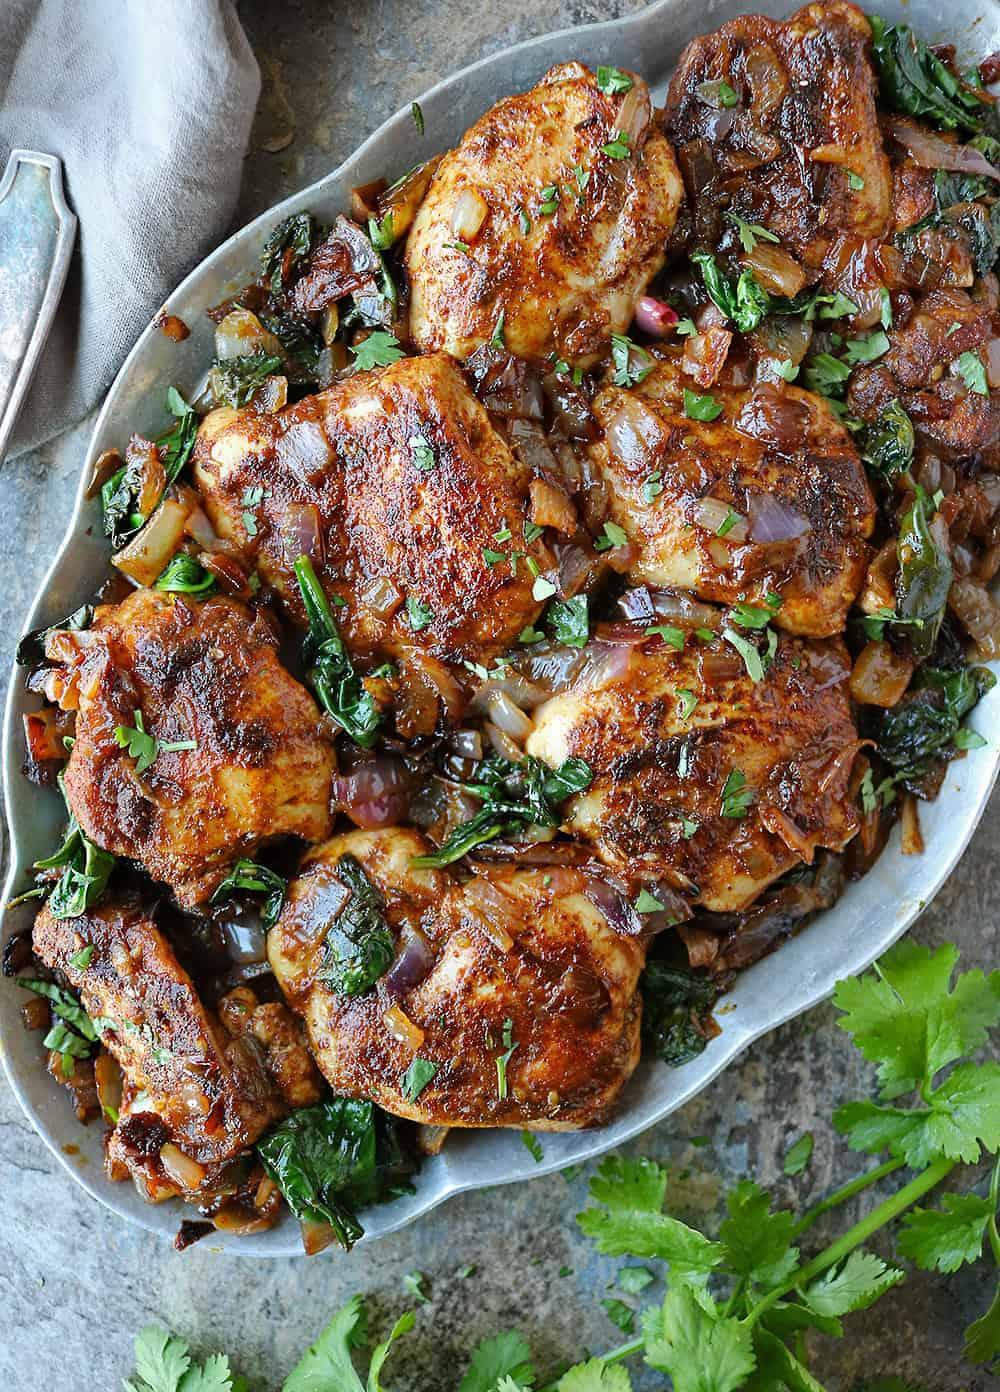 Easy Za'atar Ras-el-hanout Chicken Spinach Dinner